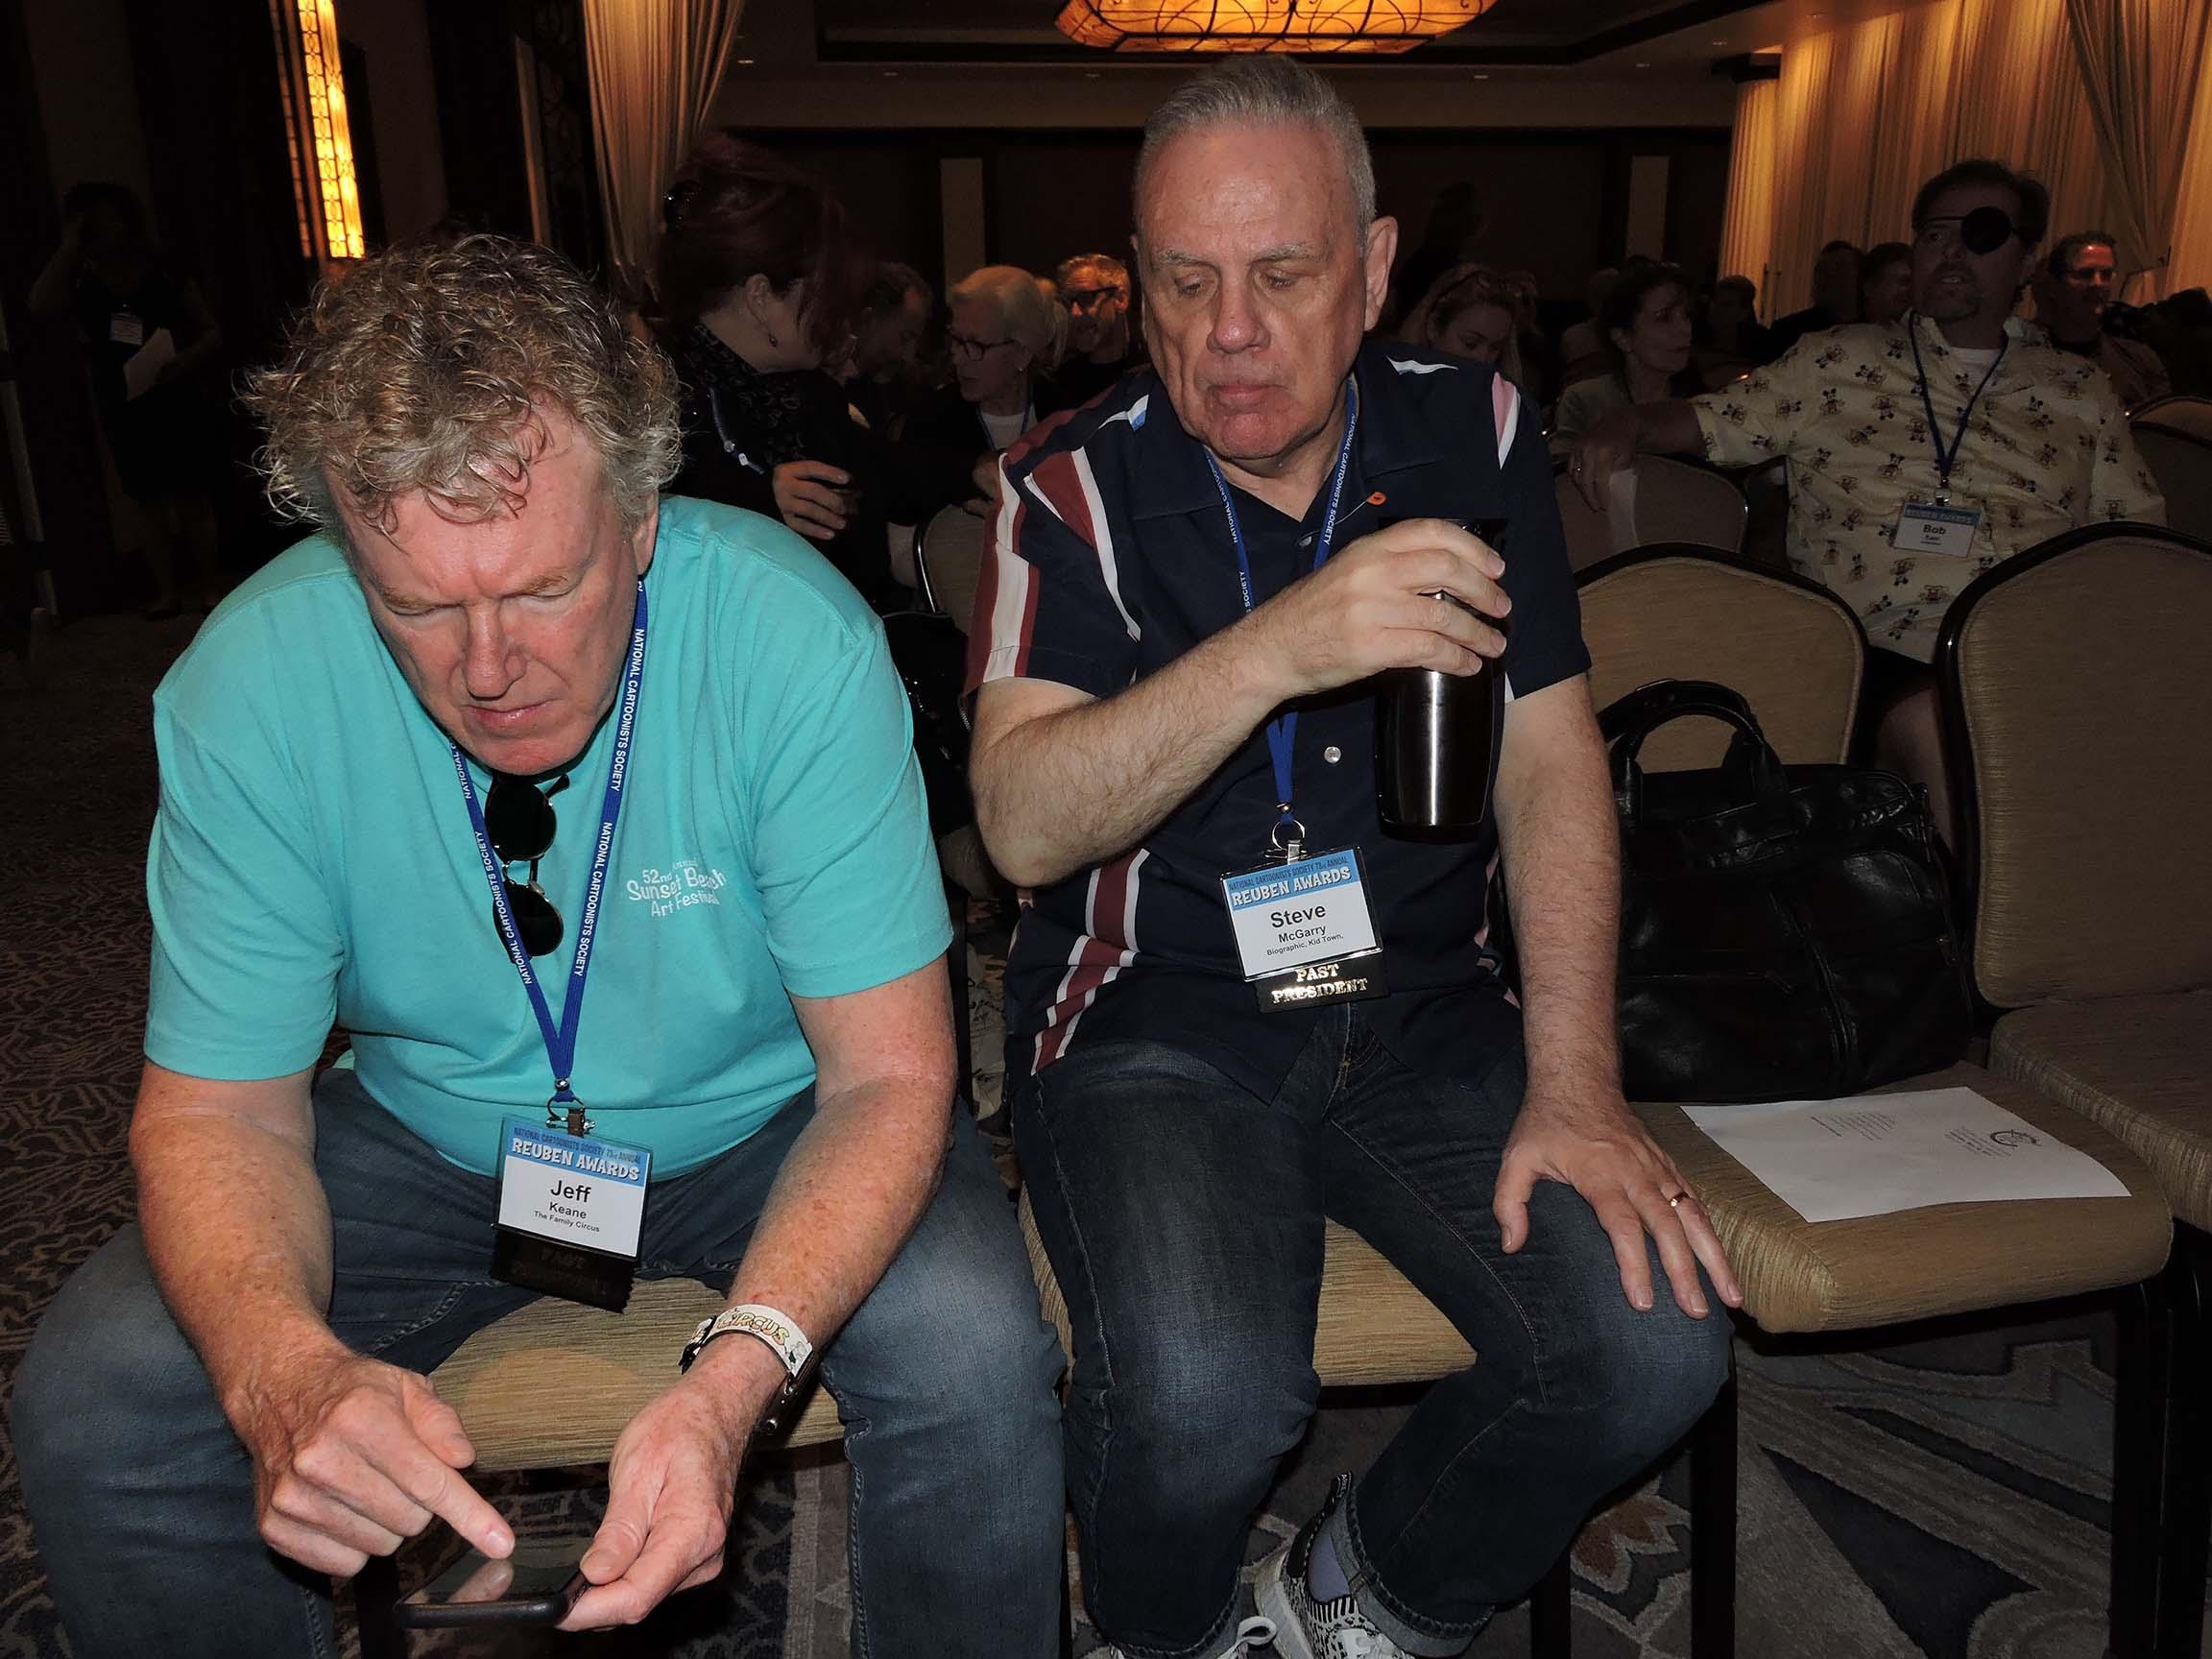 Jeff Keane (left) and Steve McGarry